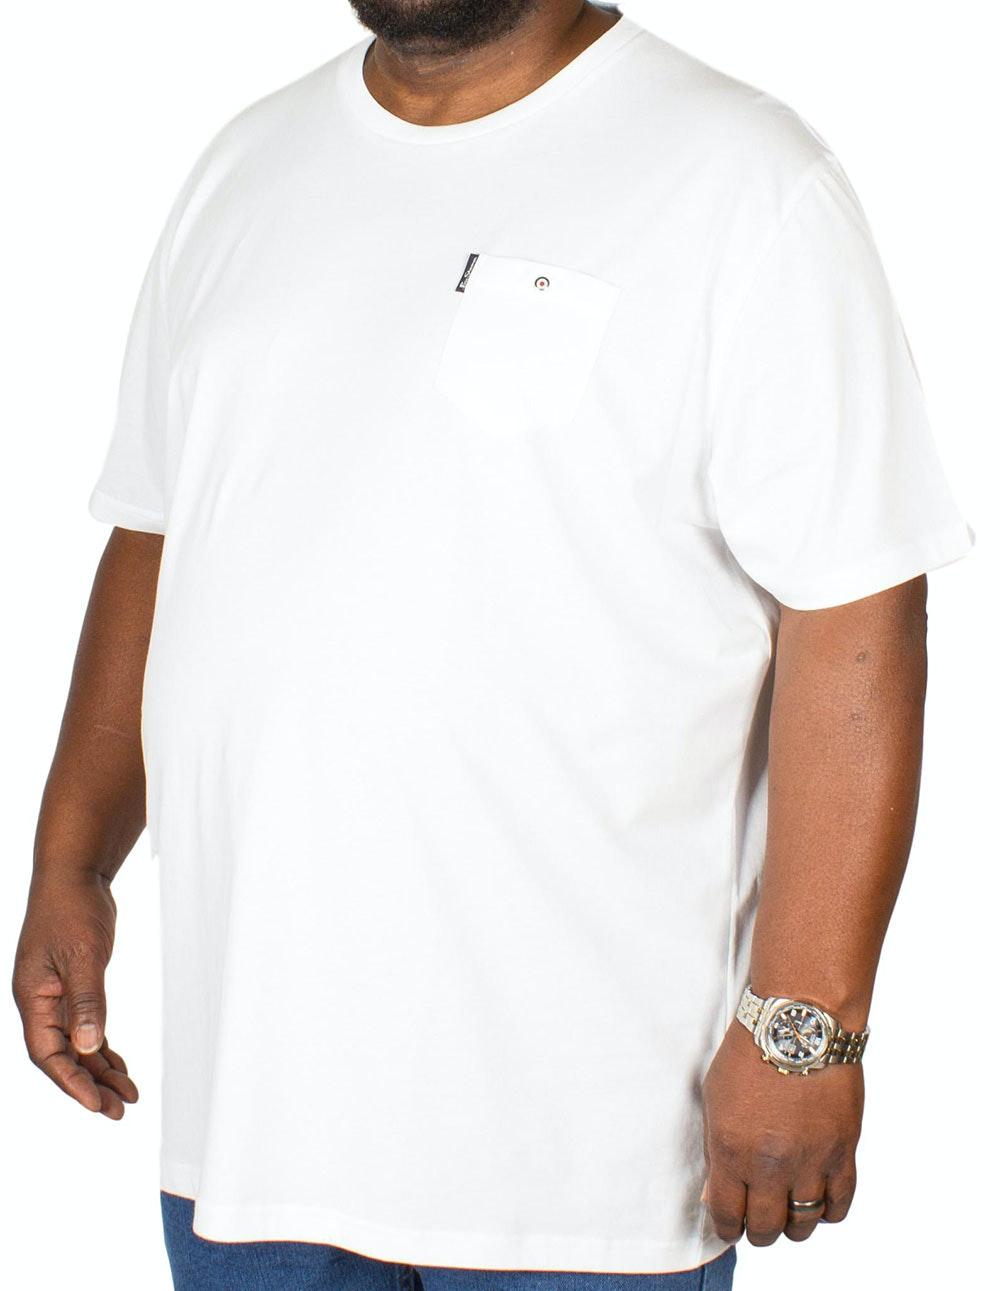 Ben Sherman Spade Pocket T-Shirt White